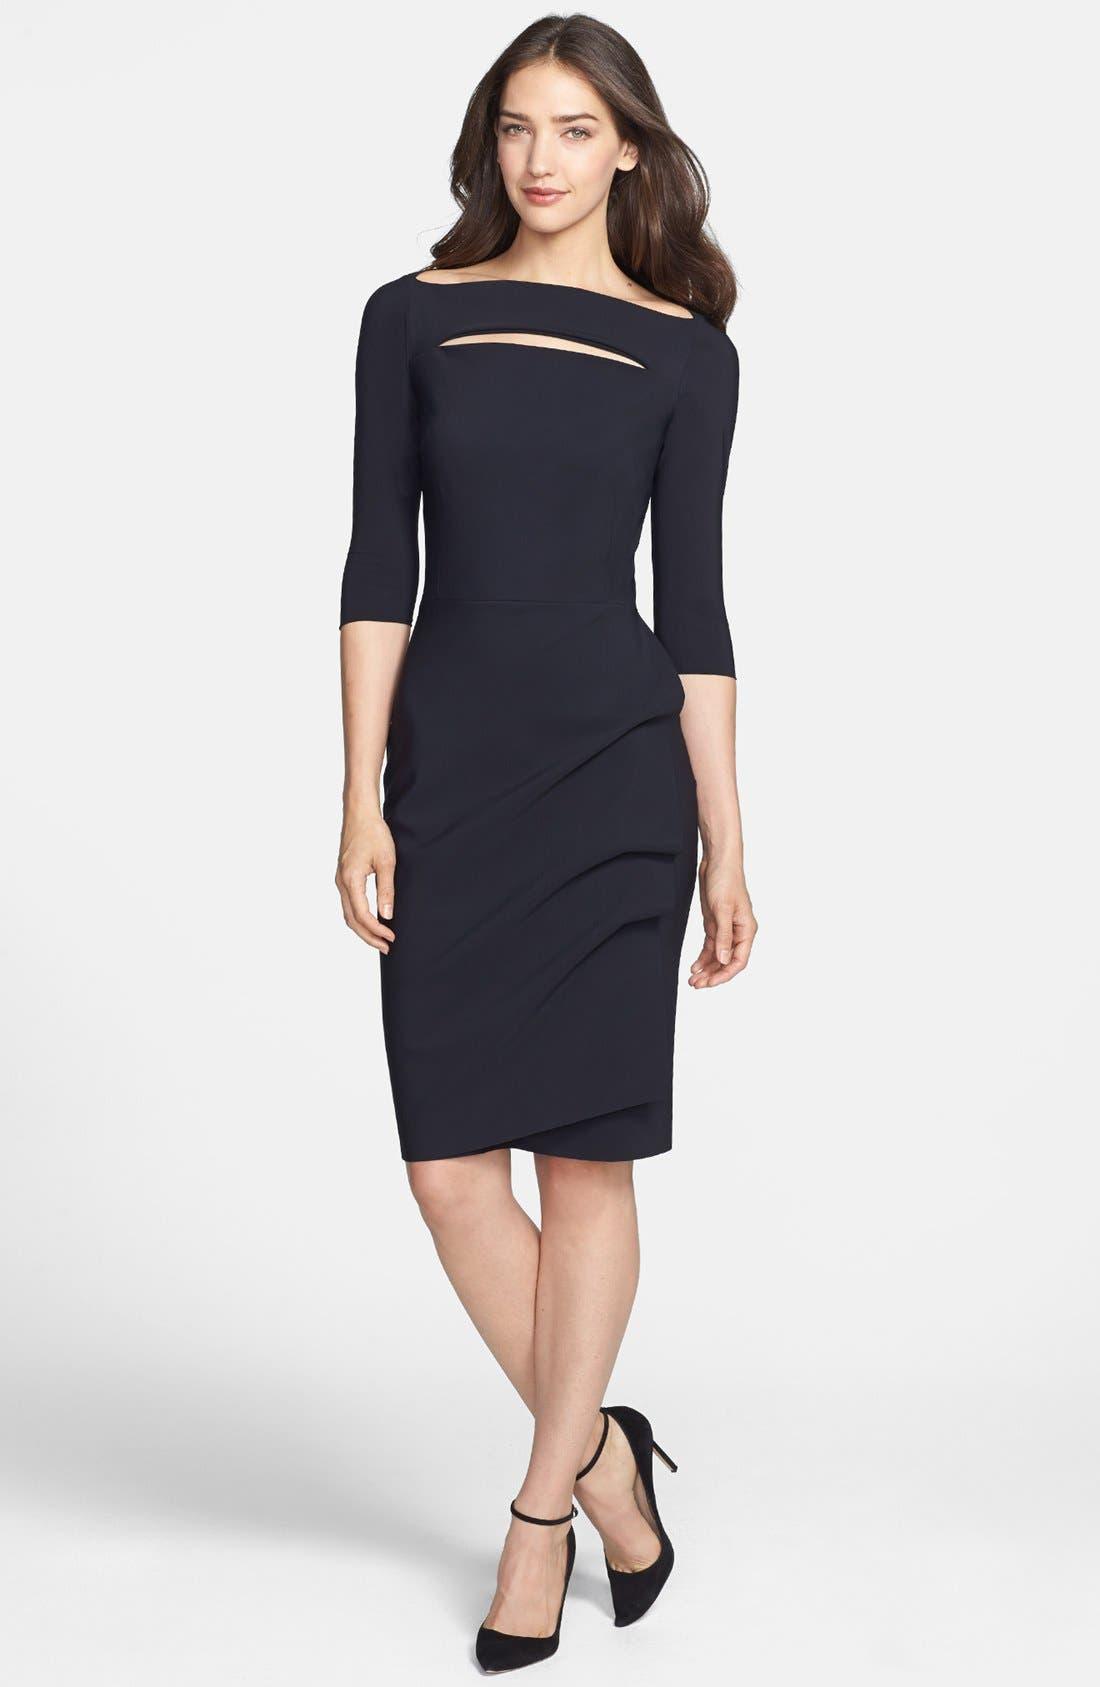 Alternate Image 1 Selected - La Petite Robe by Chiara Boni Cutout Jersey Sheath Dress